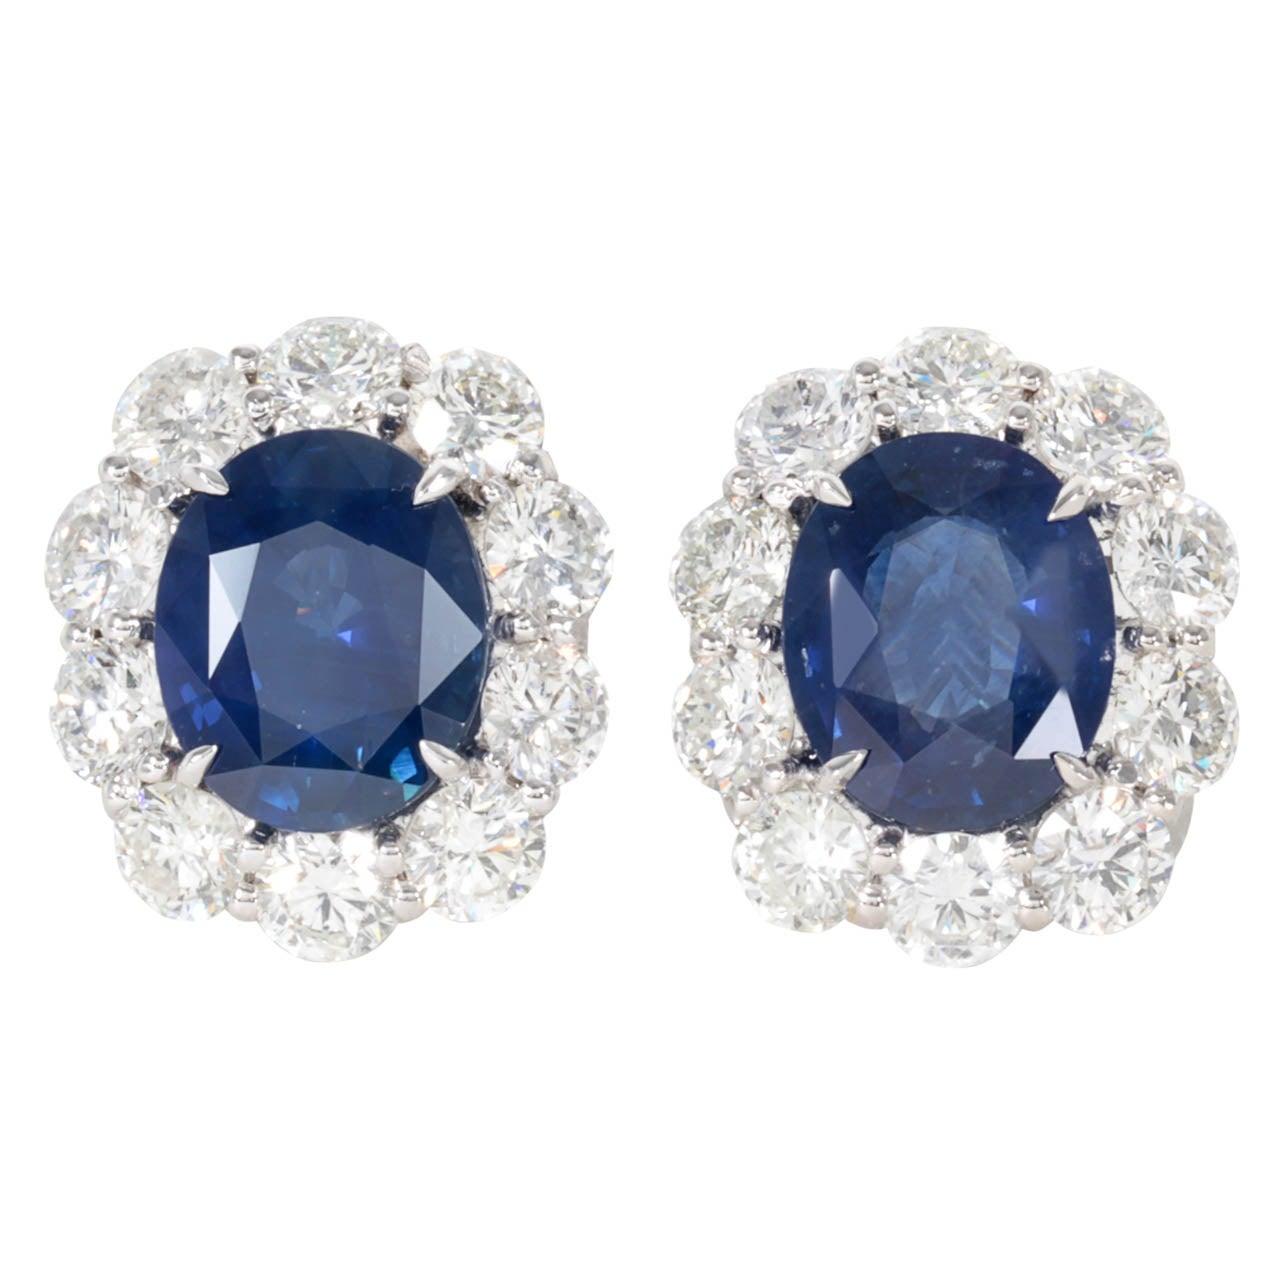 Exquisite Ceylon Sapphire Diamond Gold Earrings